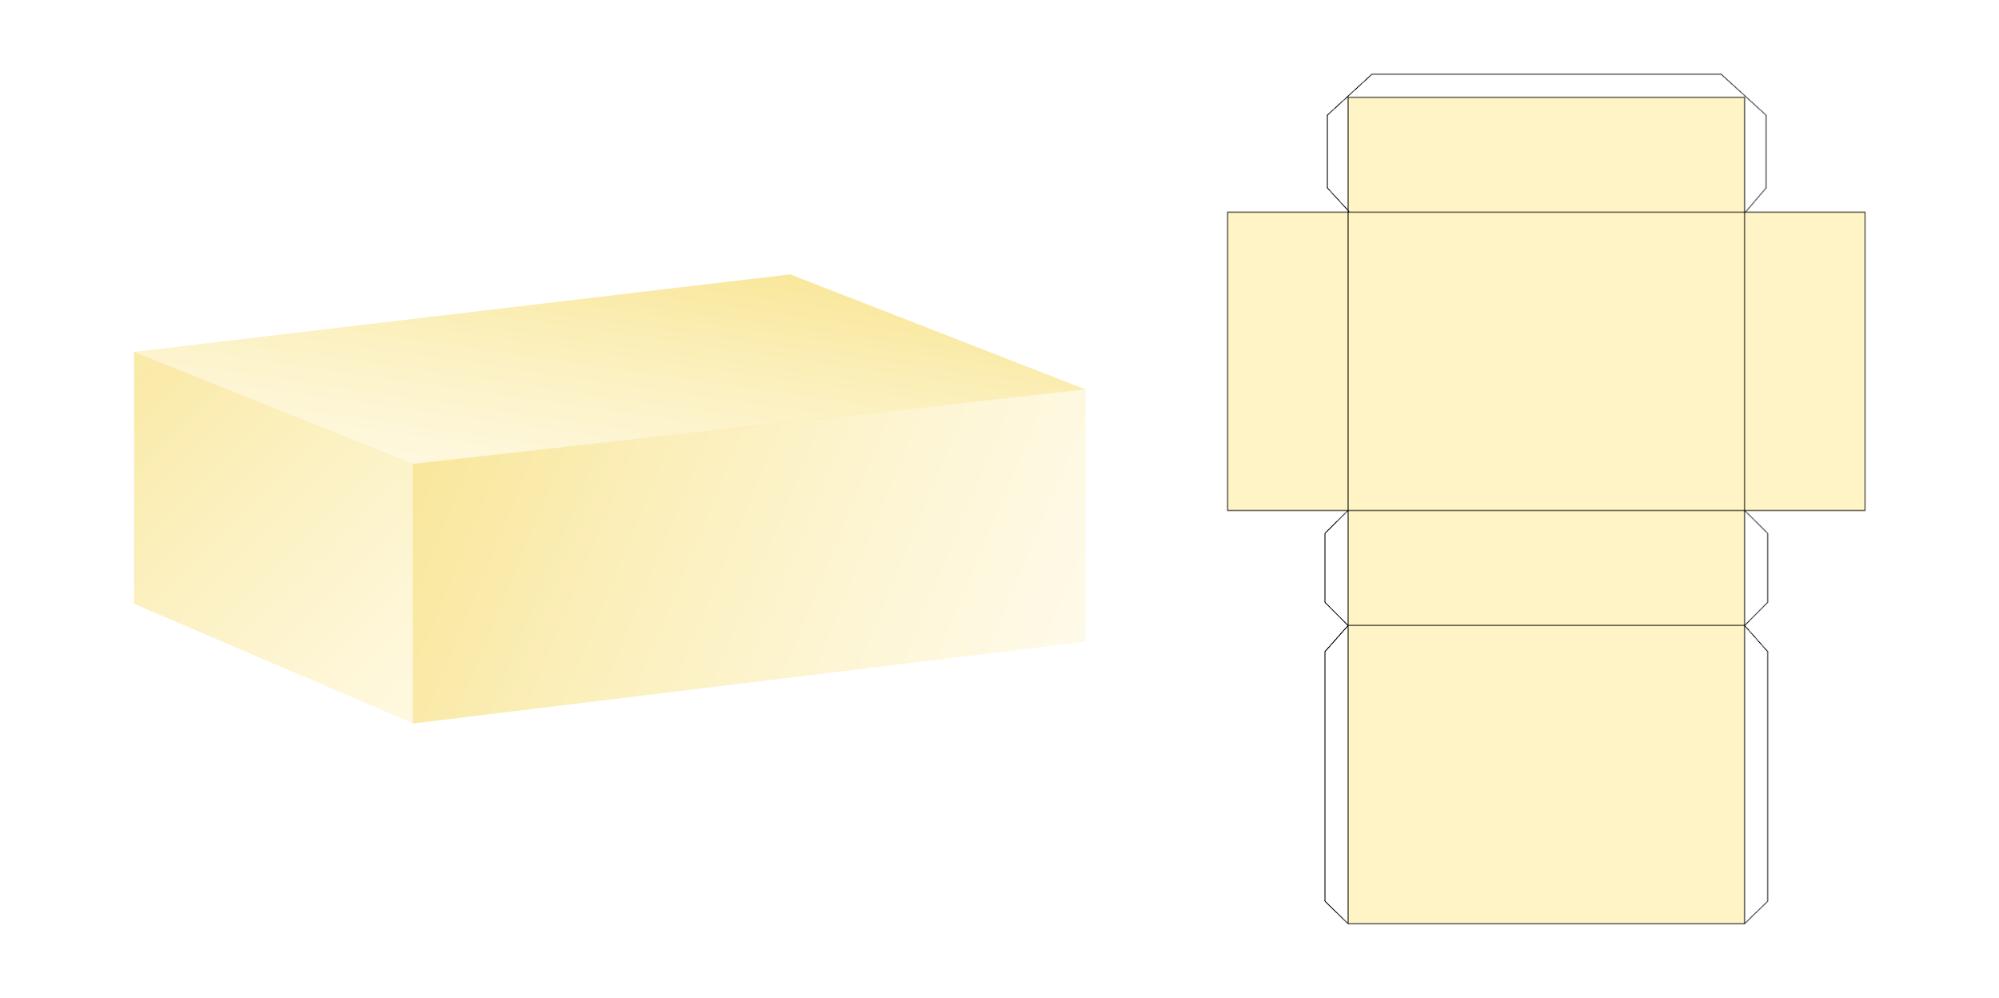 Прямоугольный параллелепипед 1